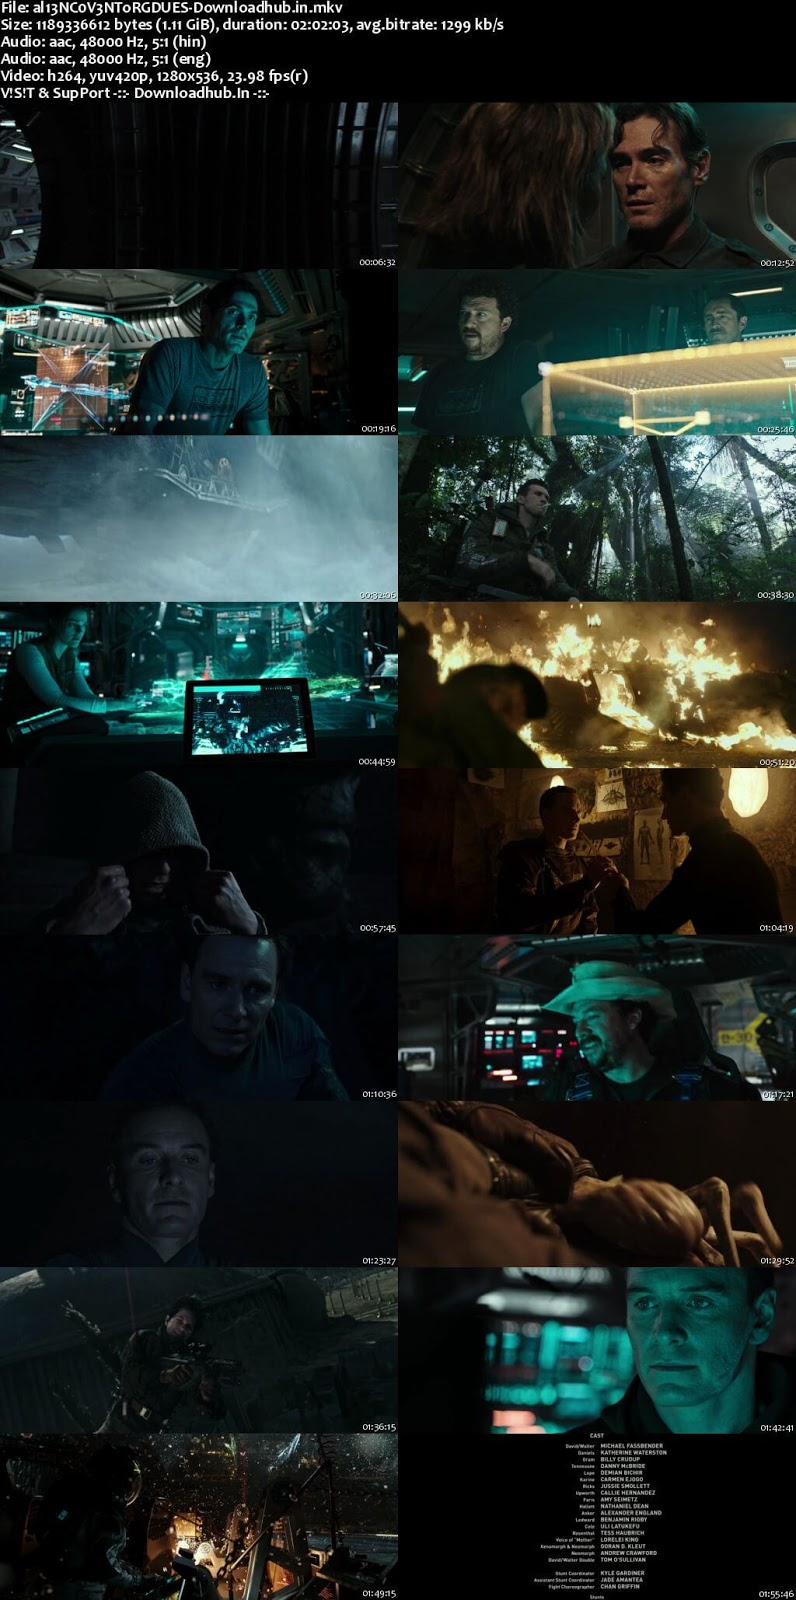 Alien Covenant 2017 Dual Audio 720p Bluray Org Hindi English